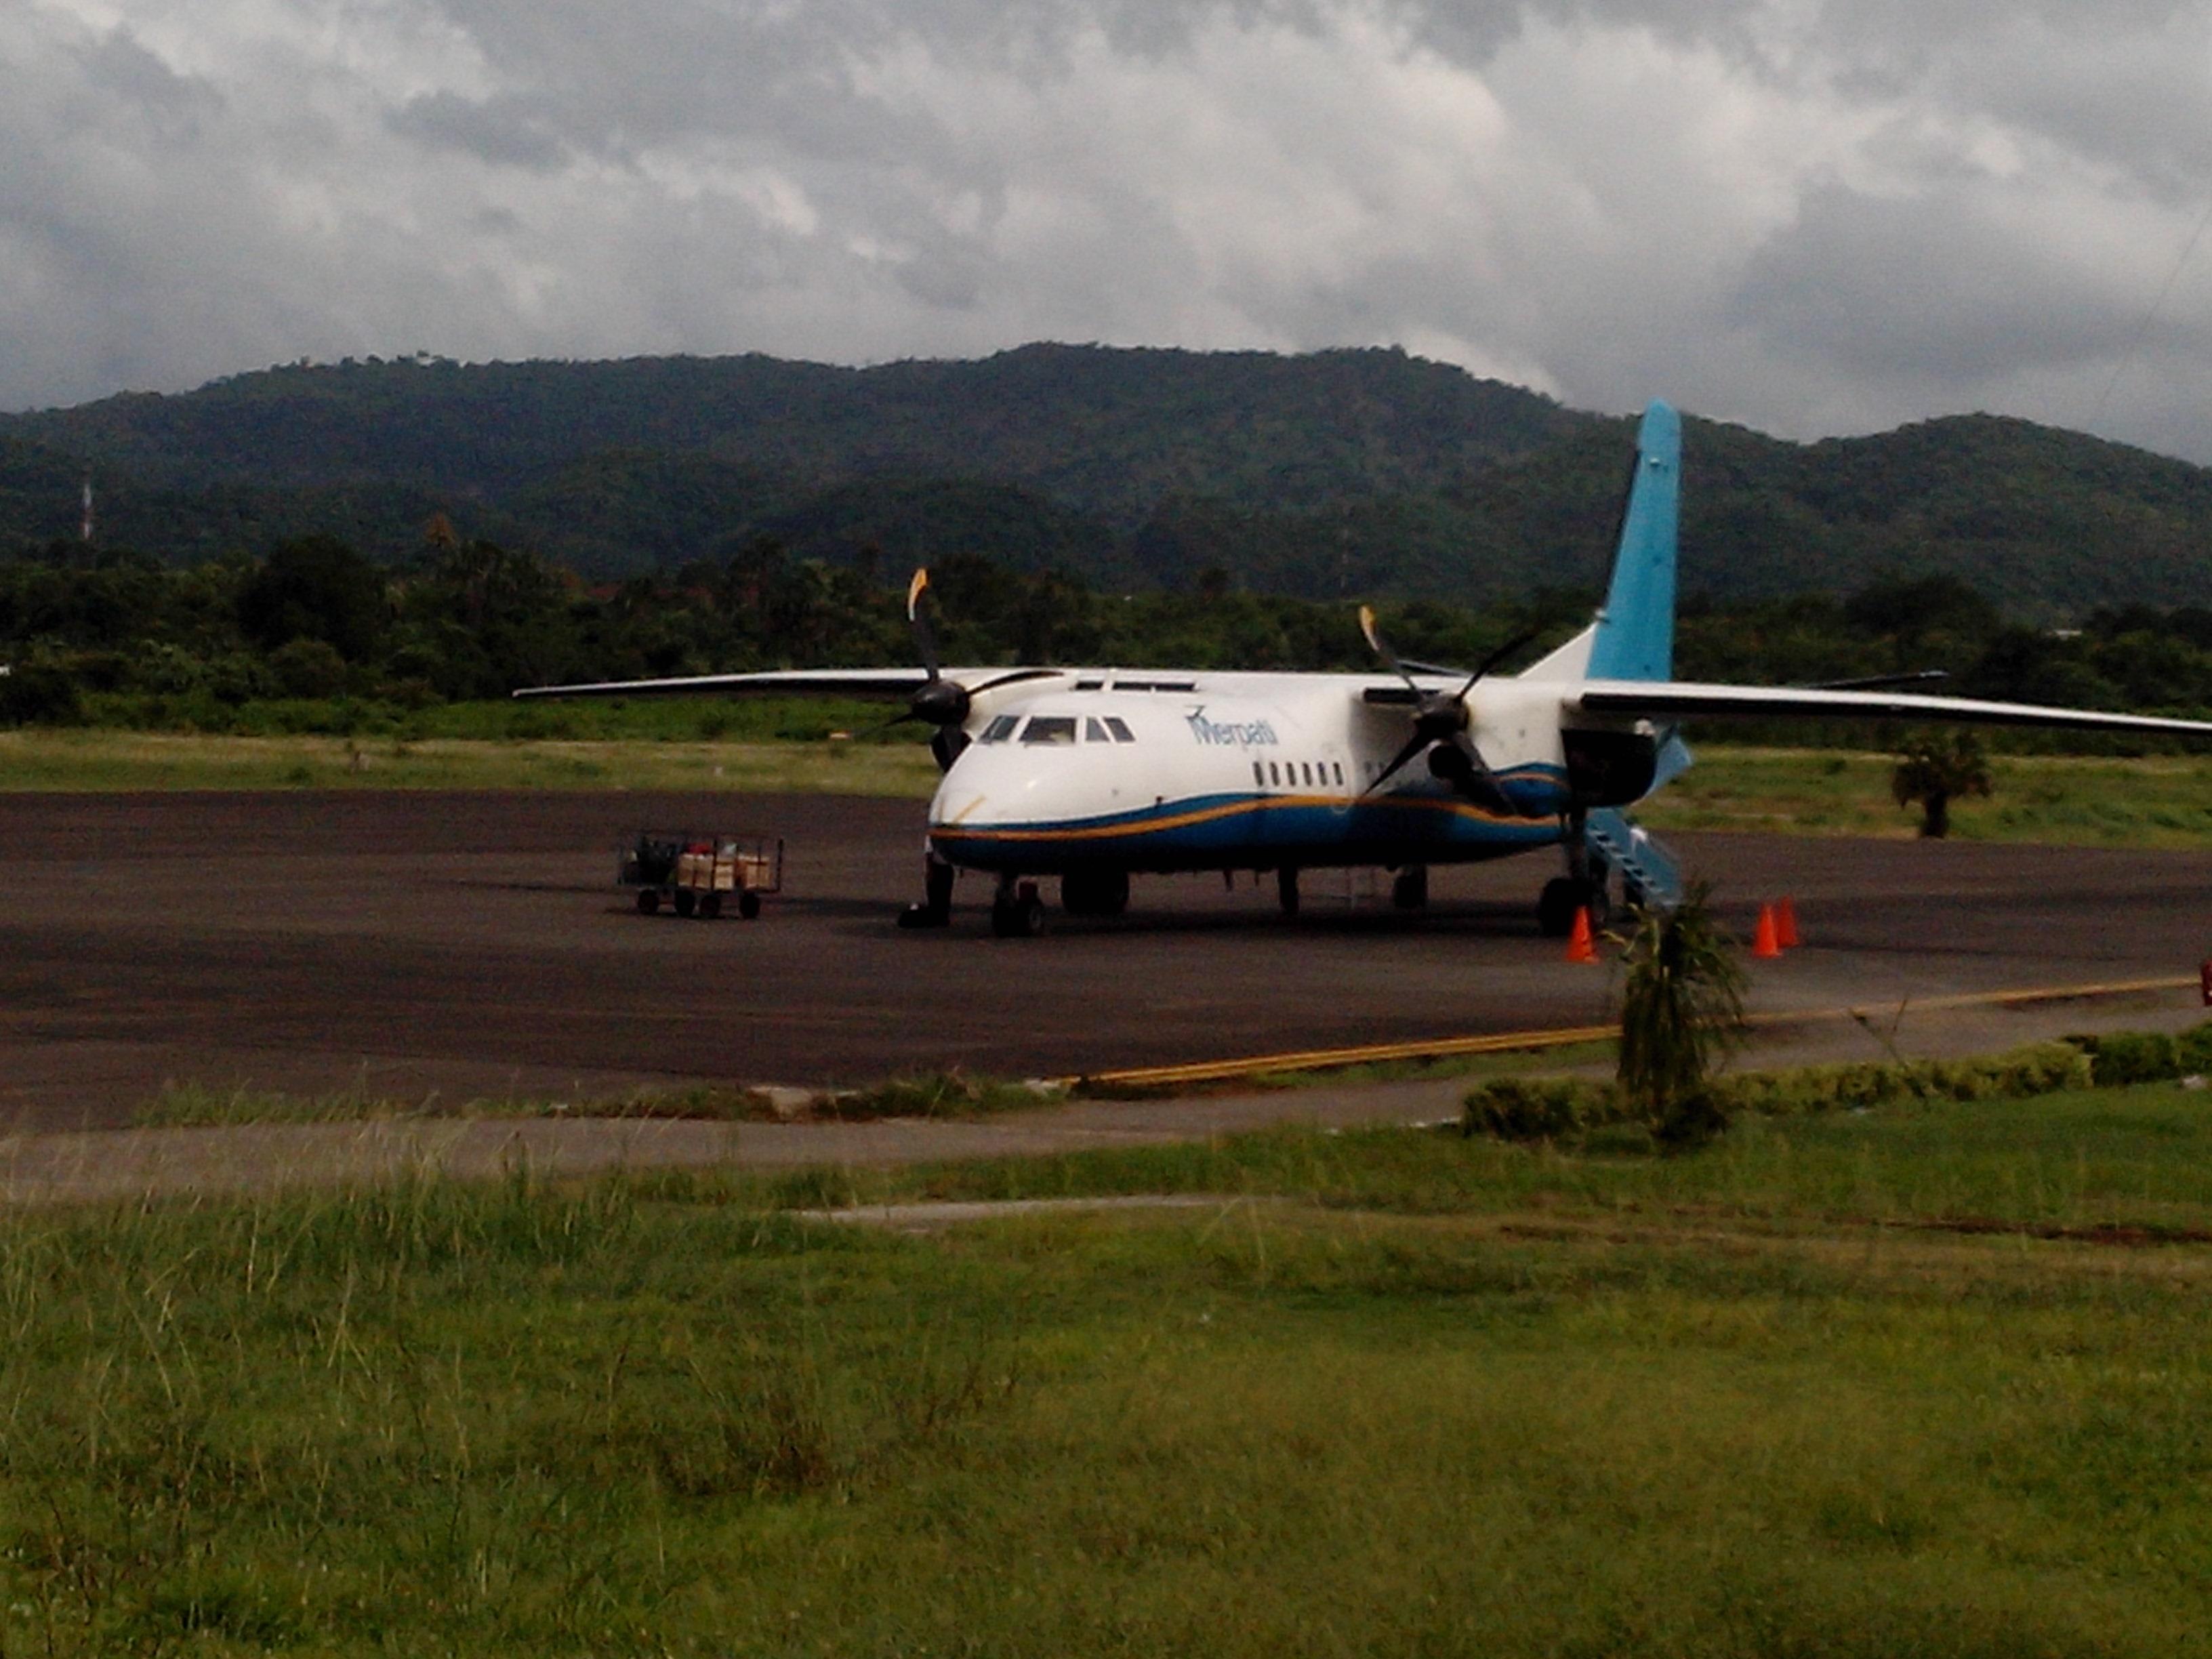 5 16 - Аэропорт Айоме (Aiome) коды IATA: AIE ICAO:  город: Айоме (Aiome) страна: Папуа - Новая Гвинея (Papua New Guinea)